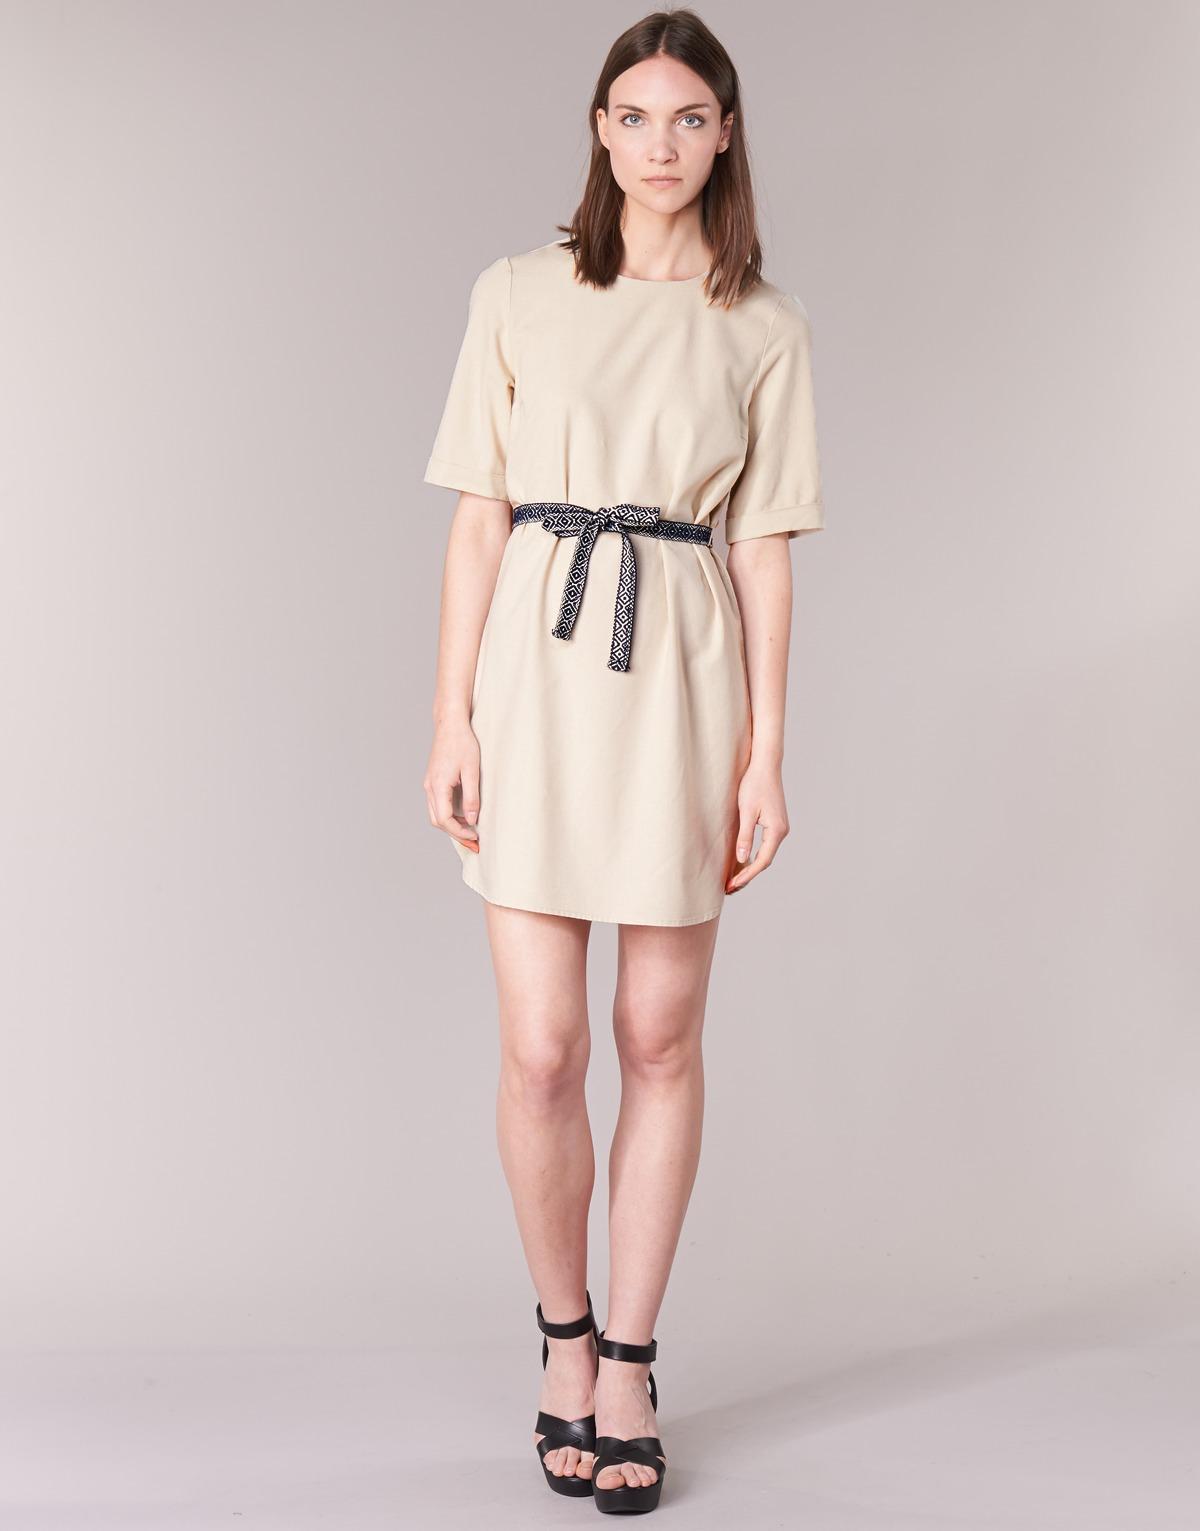 7b2f525fd97 Κοντά Φορέματα Vero Moda MILO SUKI, ΓΥΝΑΙΚΑ   ΡΟΥΧΑ   ΦΟΡΕΜΑΤΑ   ΚΟΝΤΑ